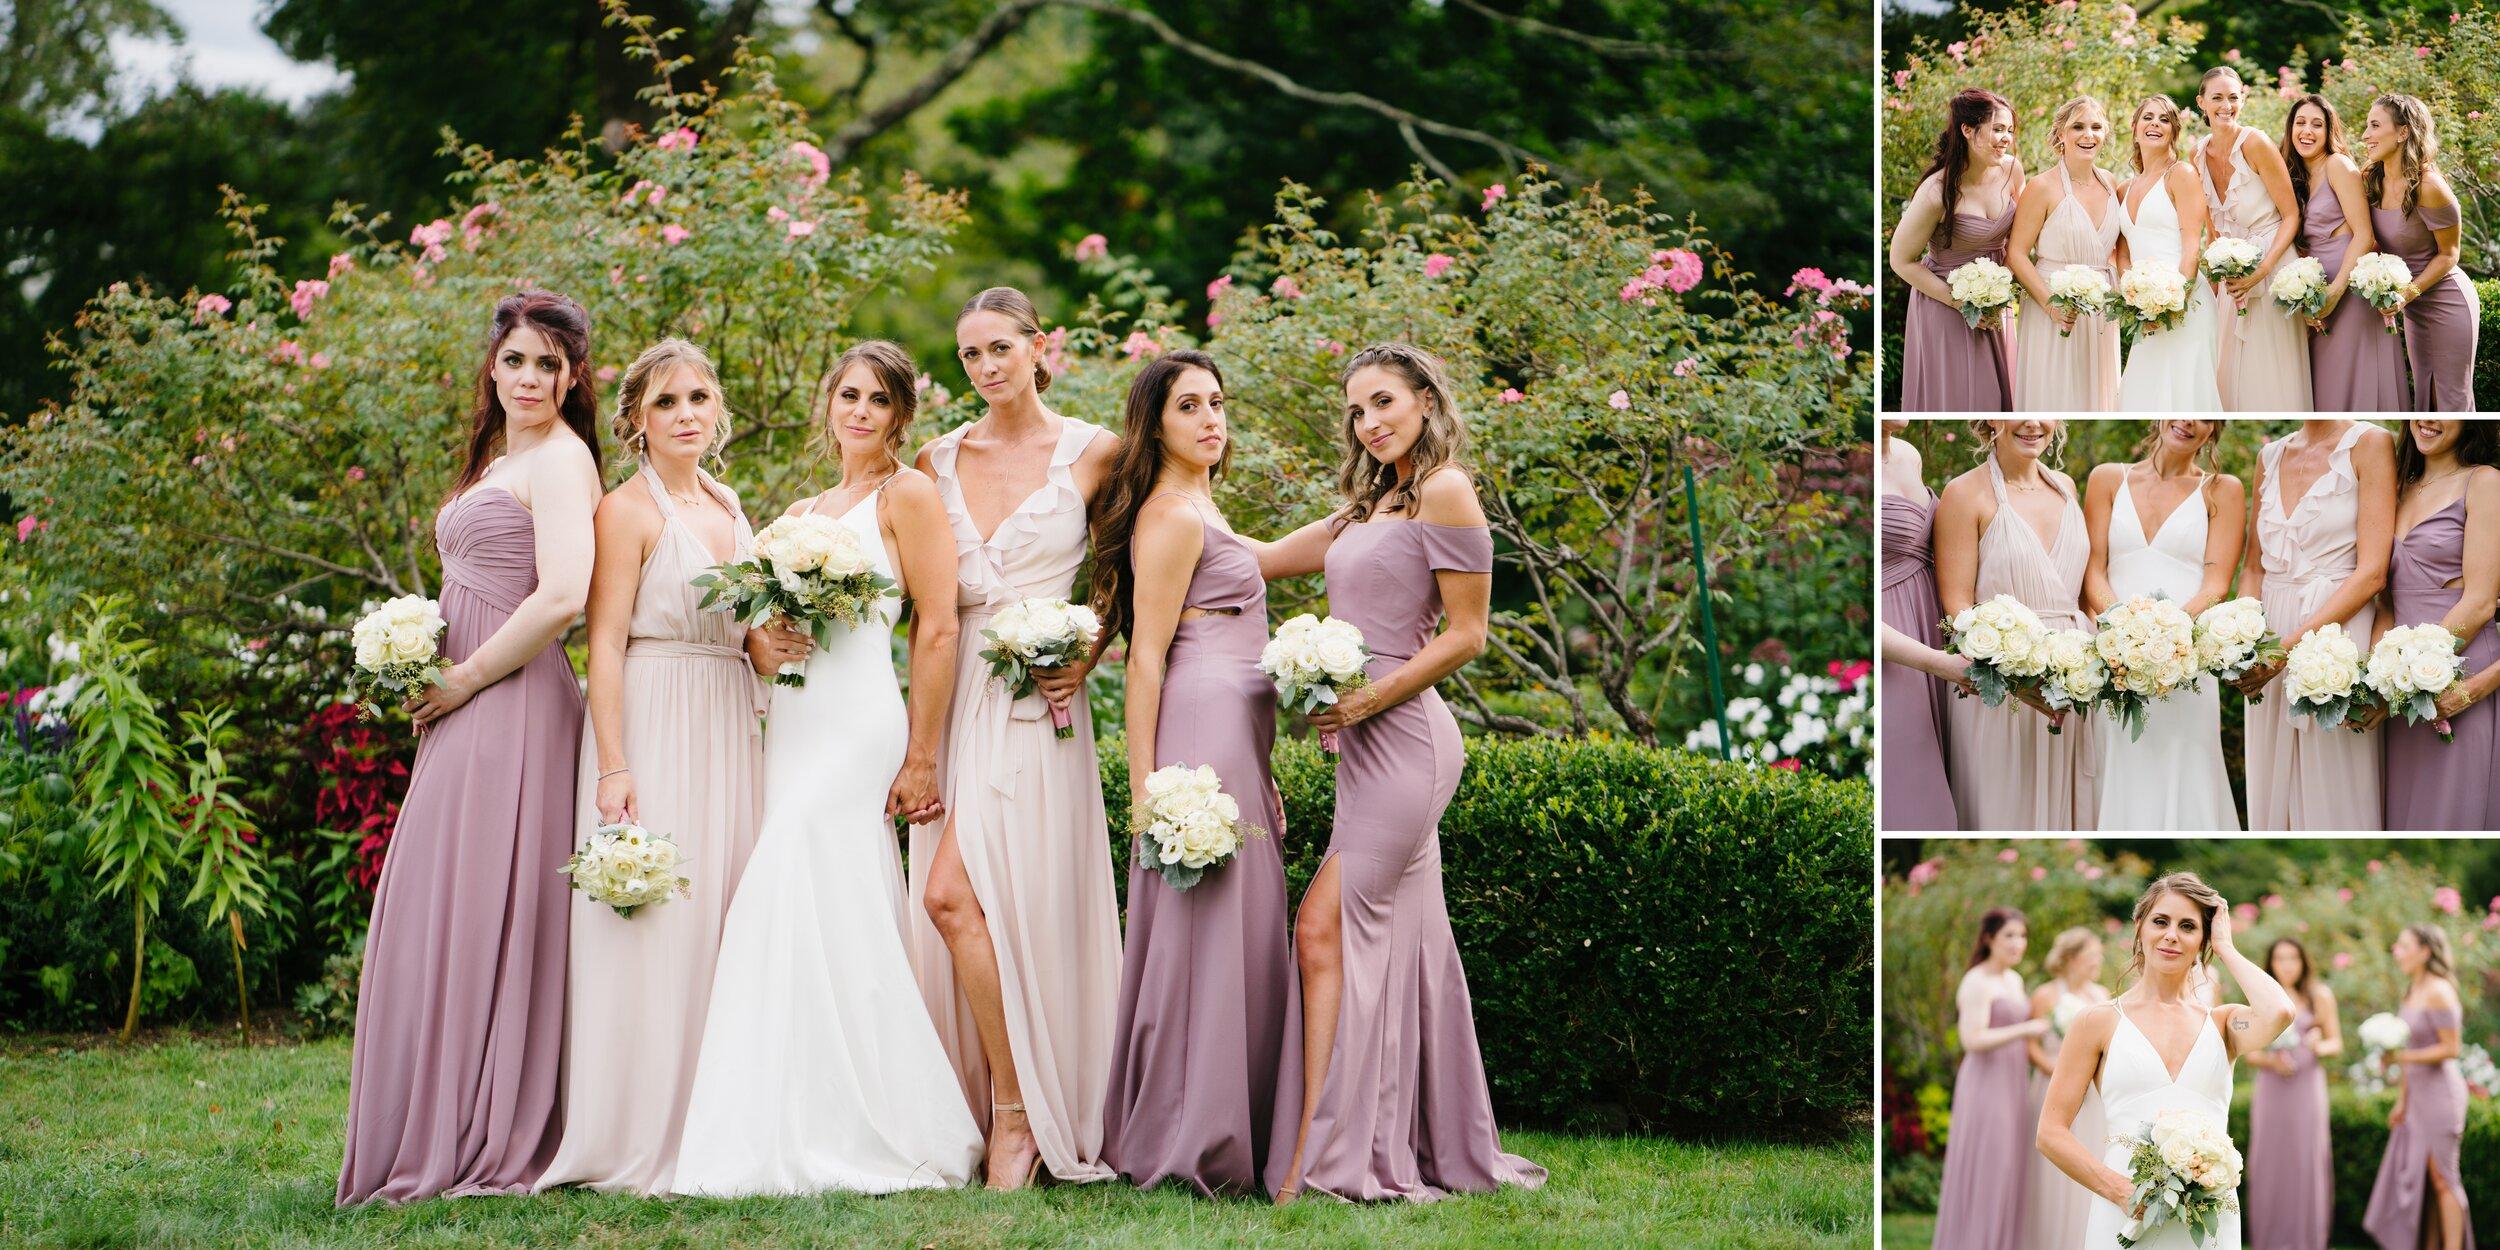 bridesmaids at Lounsbury house